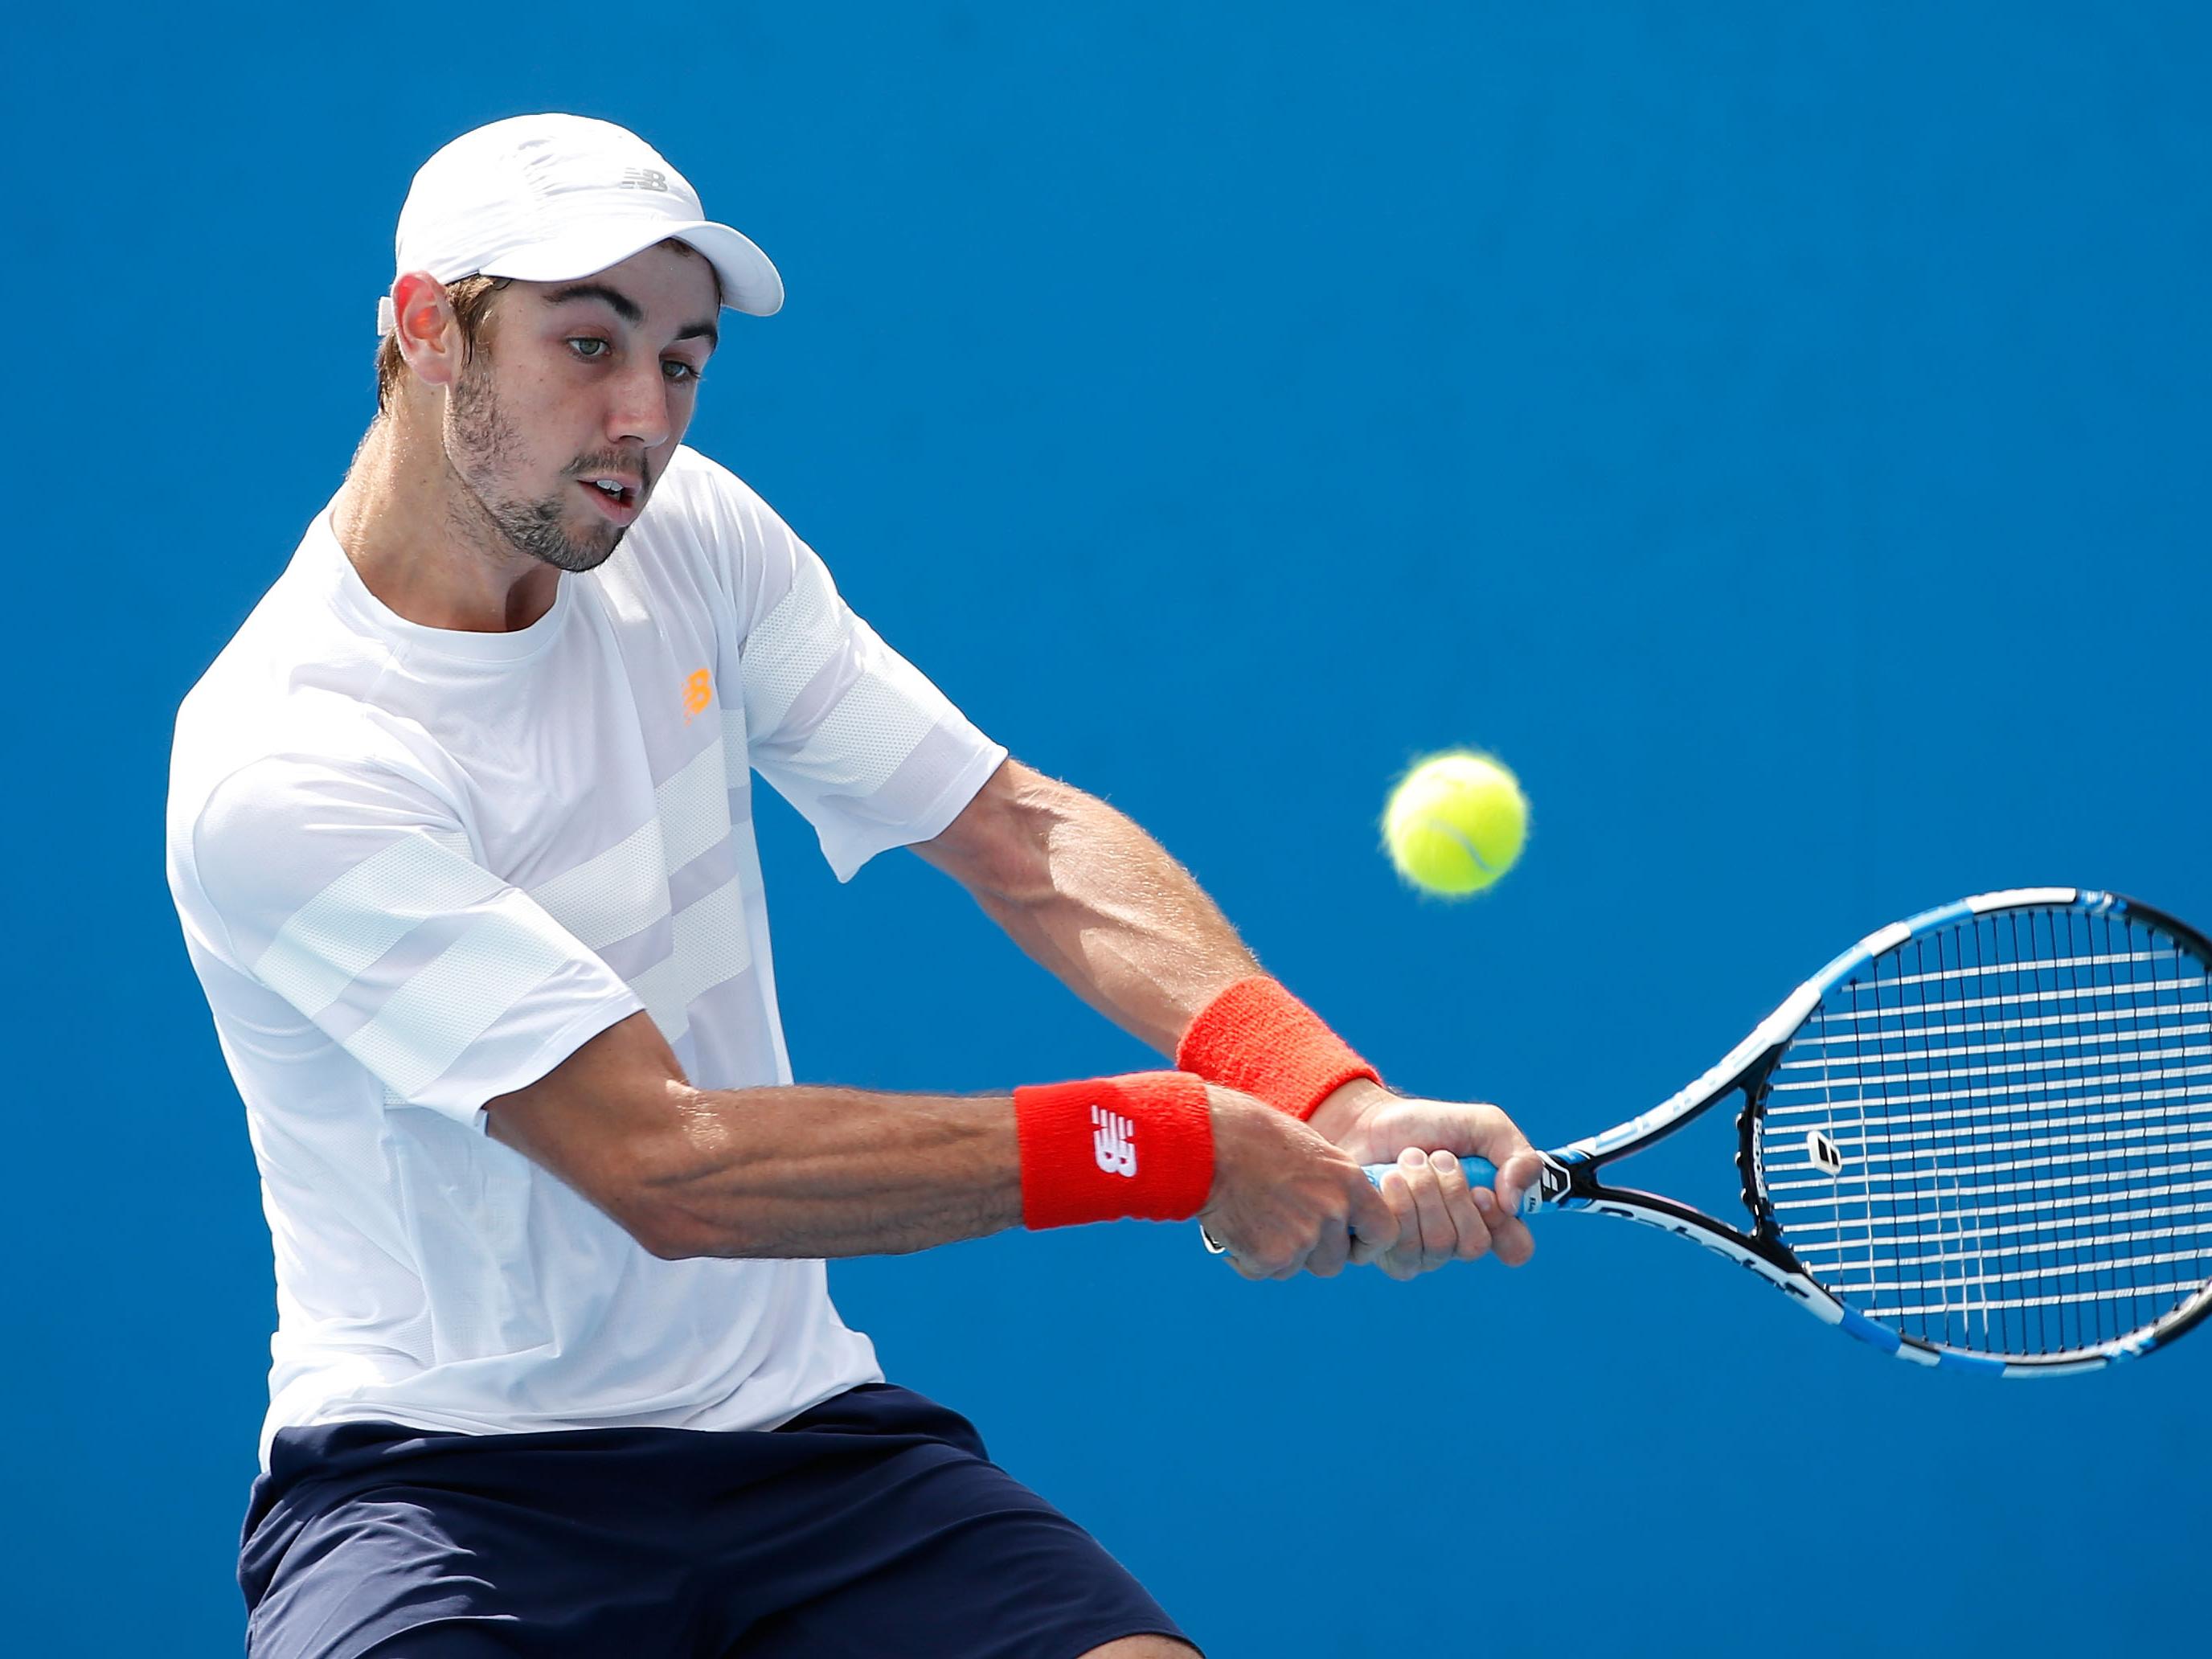 тому фото биография теннисиста пюц т входе часть